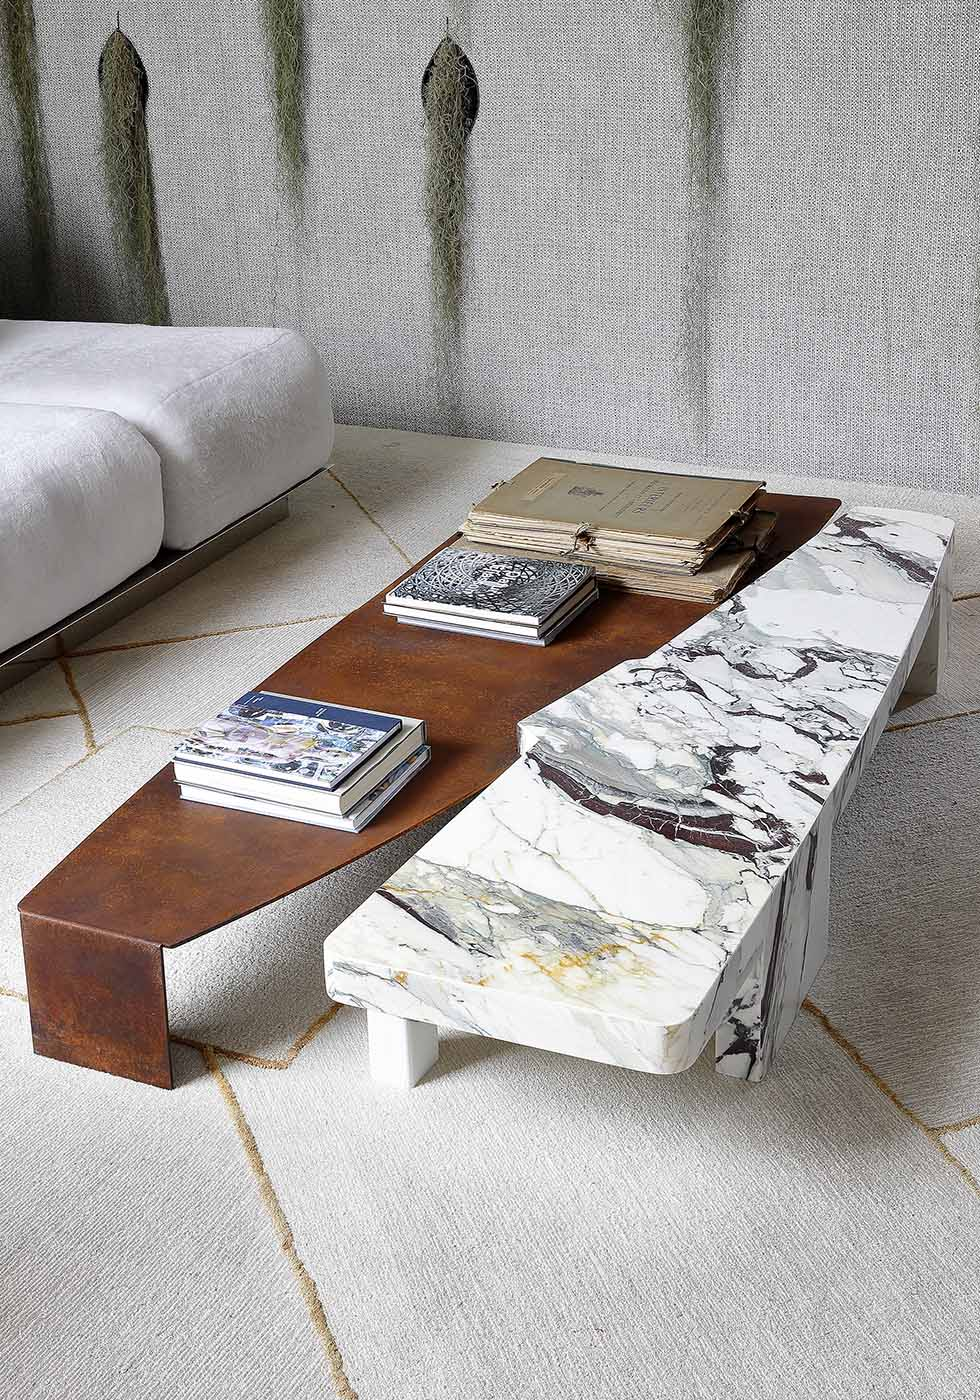 D-Block: Coffee table. Design by Bismut & Bismut.